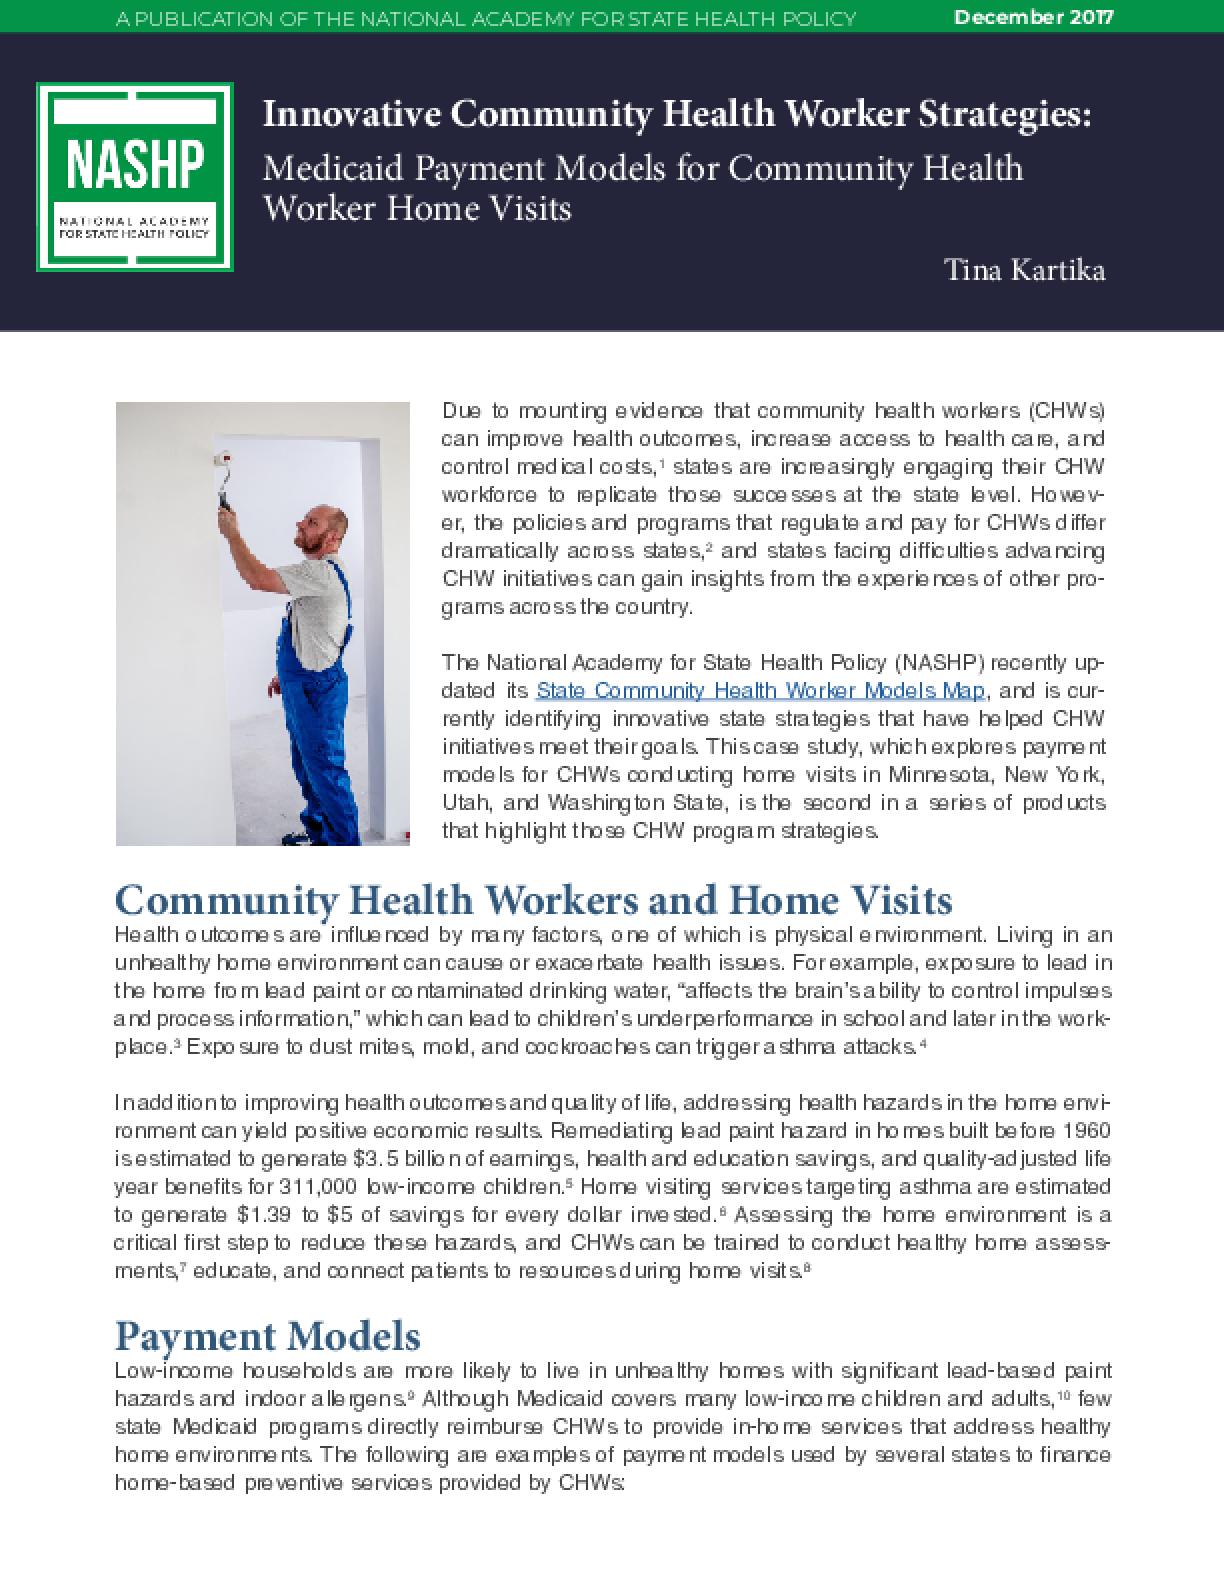 Innovative Community Health Worker Strategies: Medicaid Payment Models for Community Health Worker Home Visits